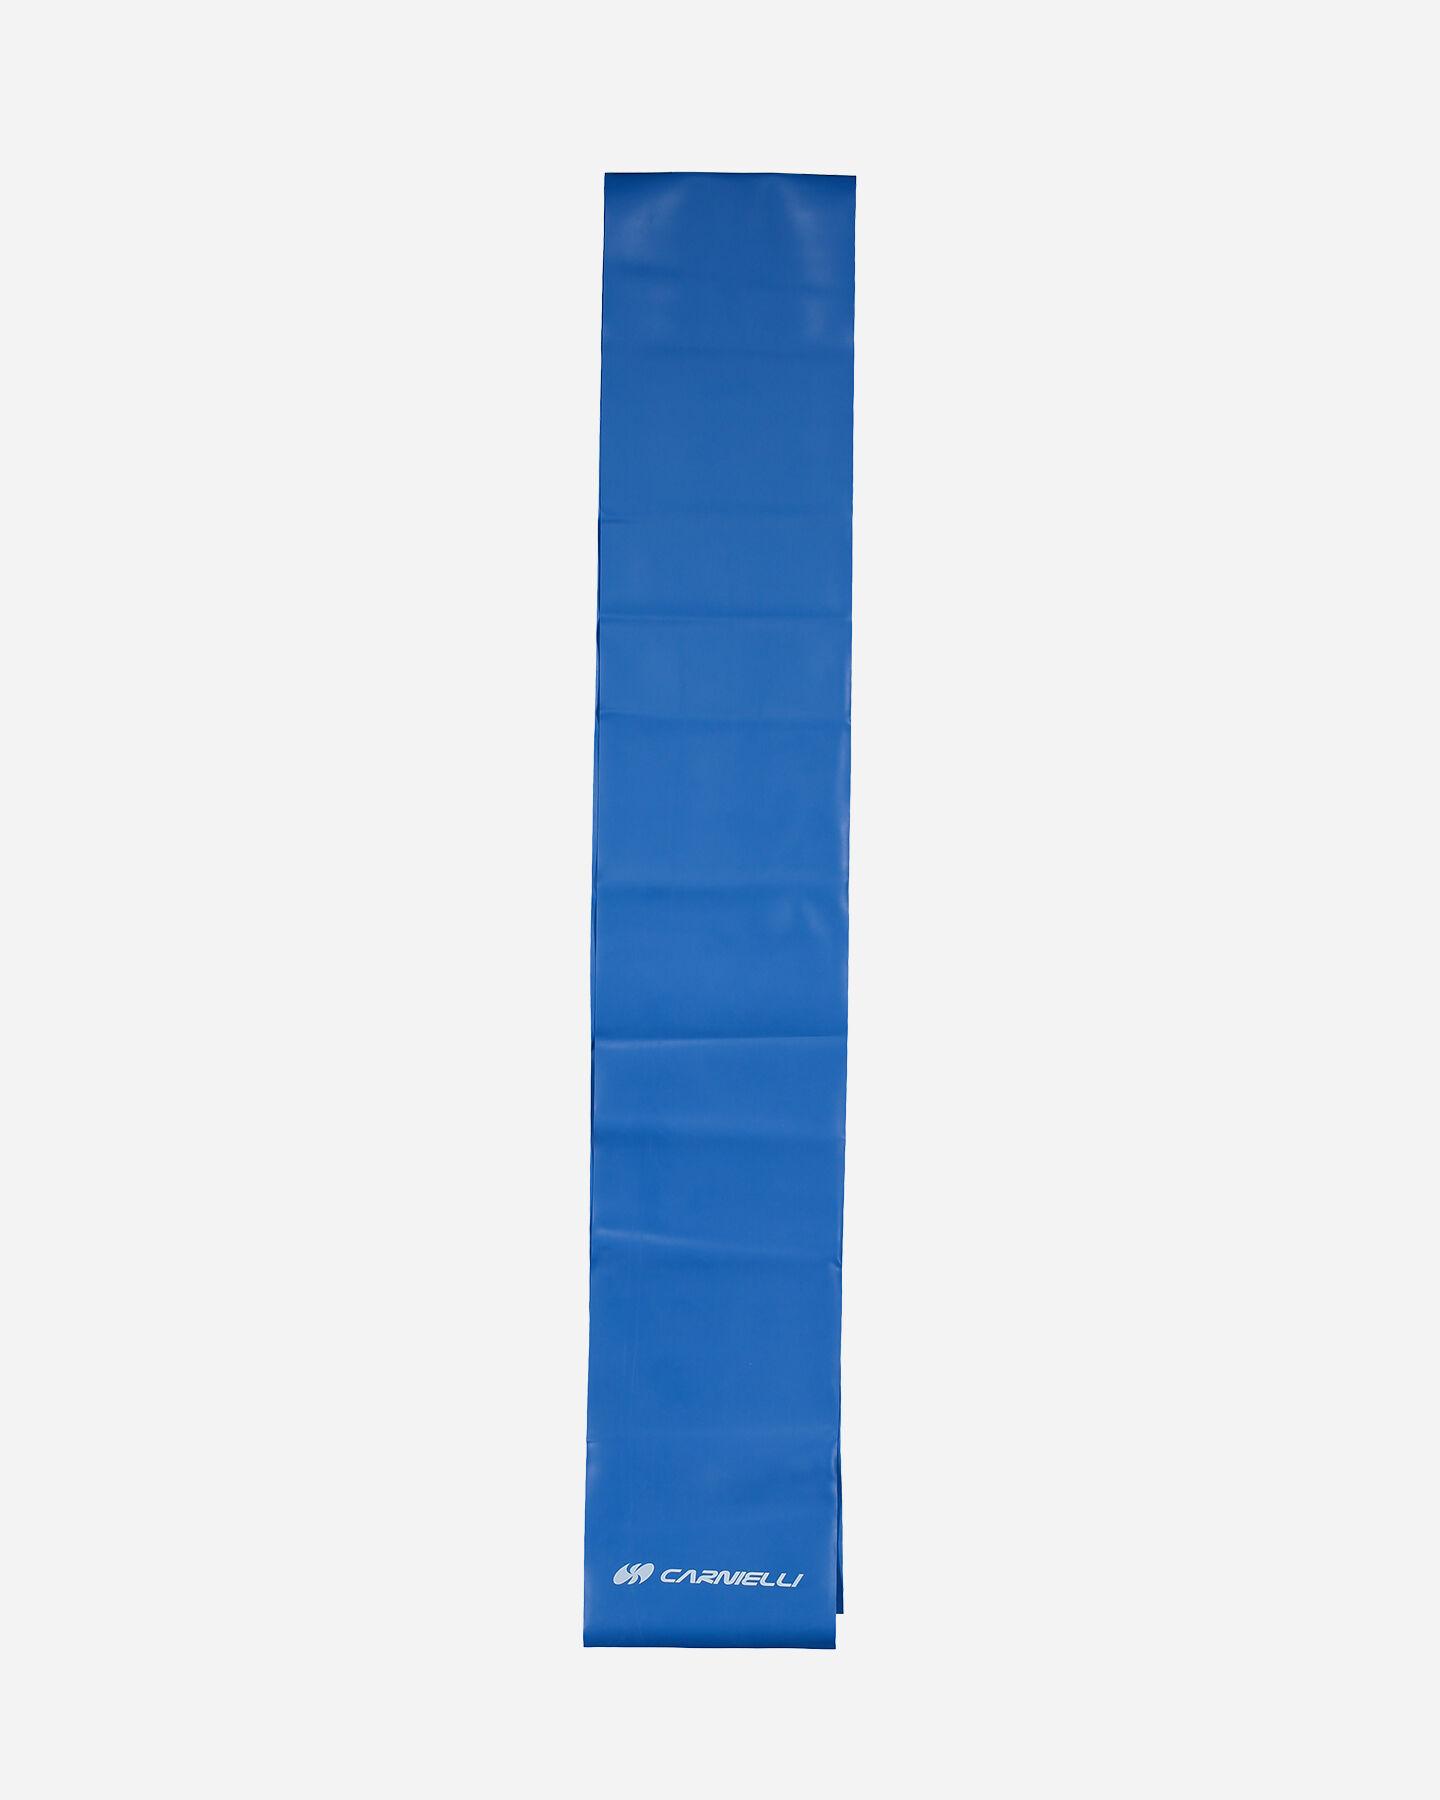 Banda elastica CARNIELLI BANDA ELASTICA 175 CM S1326888|1|UNI scatto 0